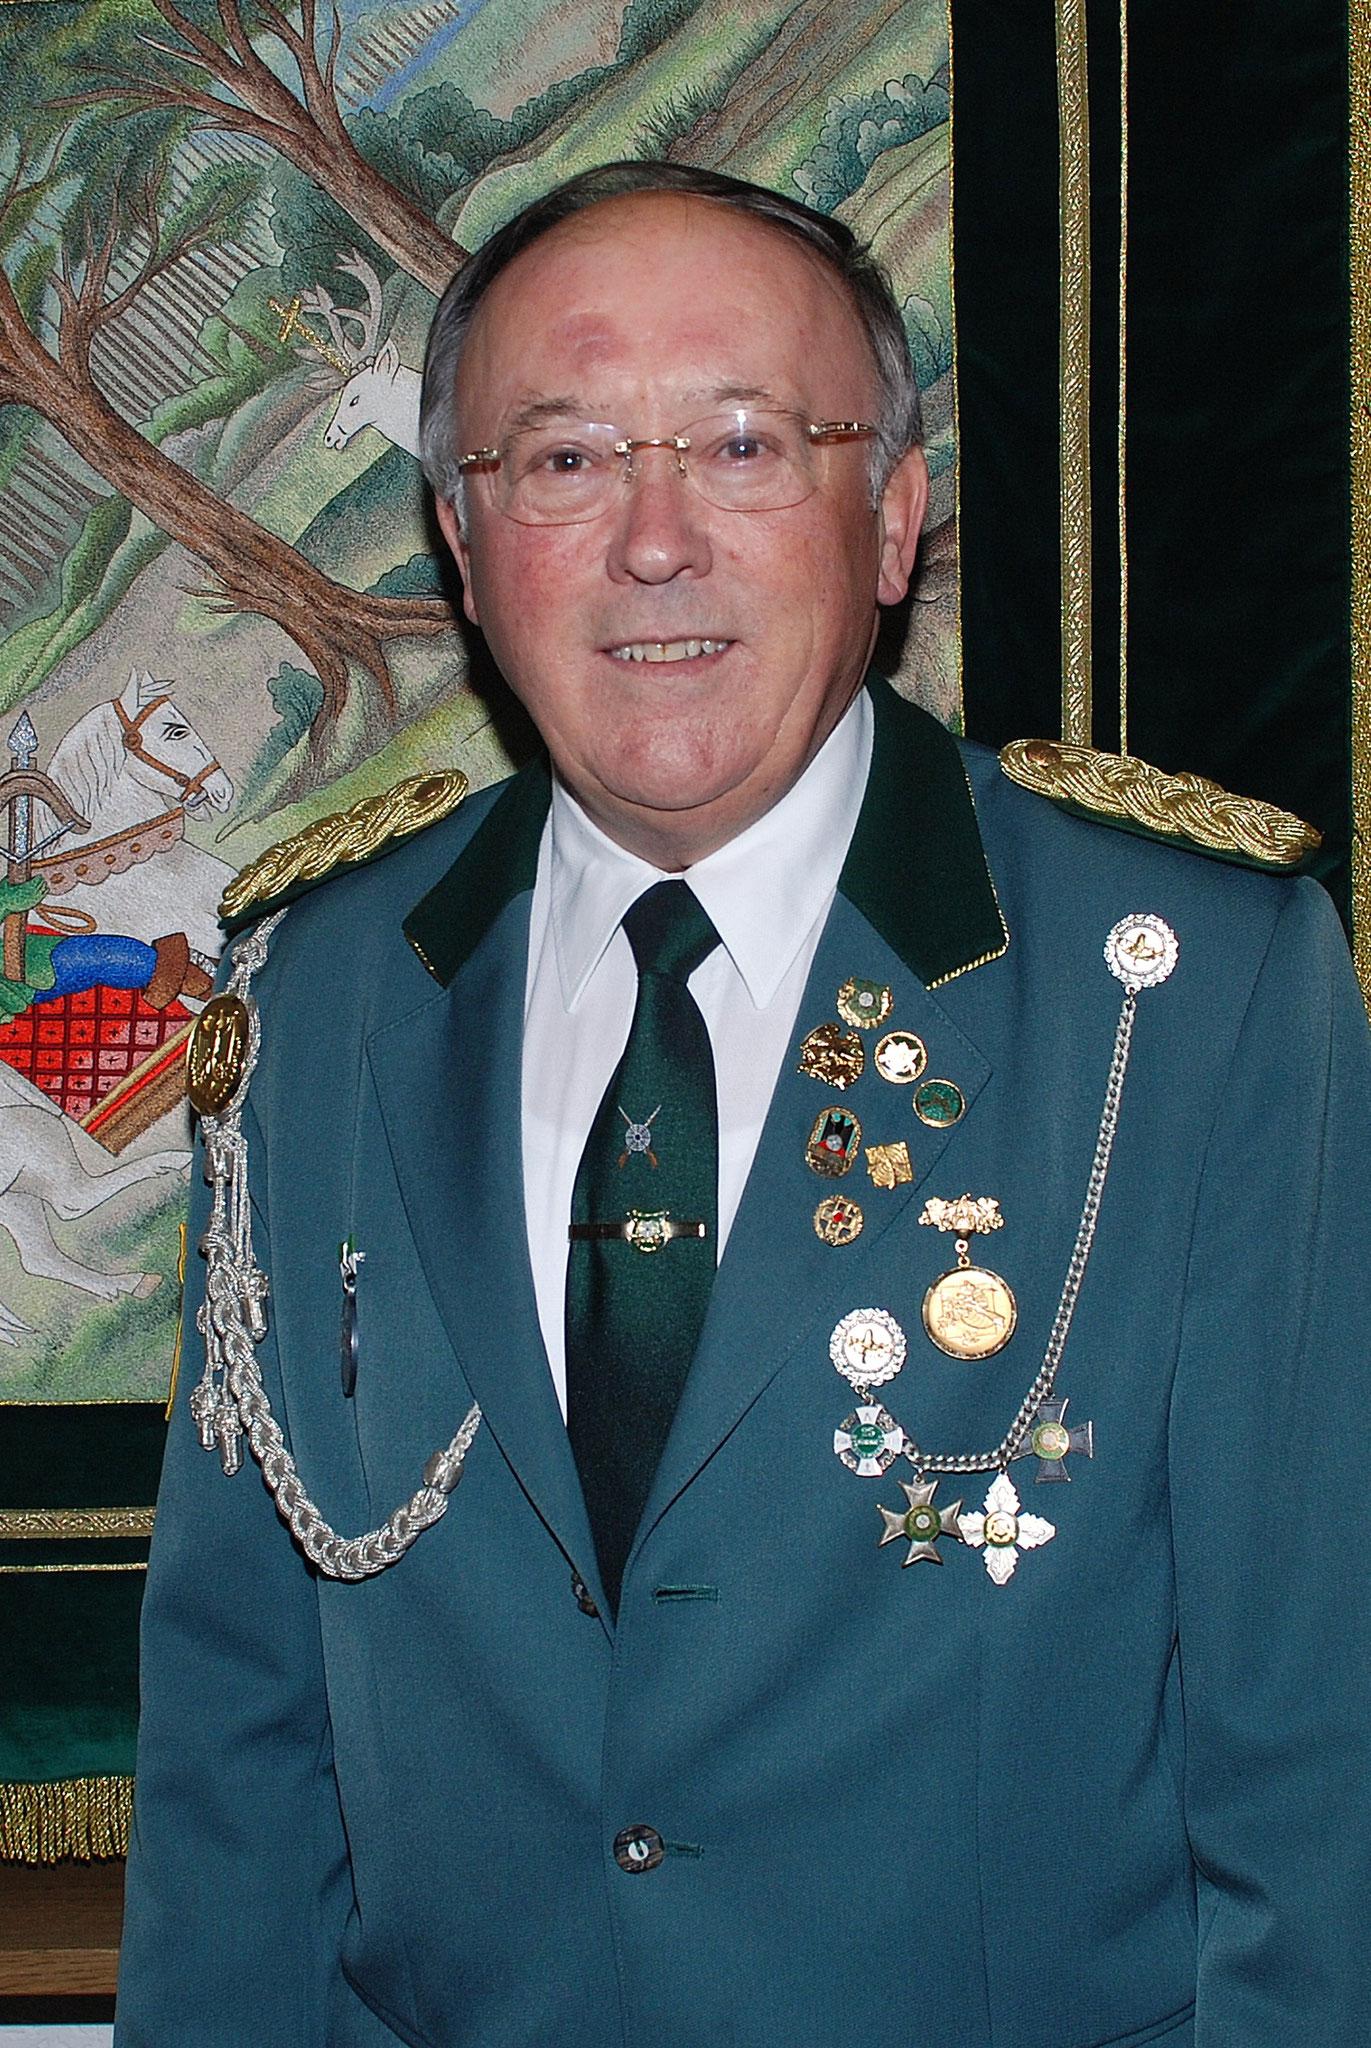 Peter Janßen